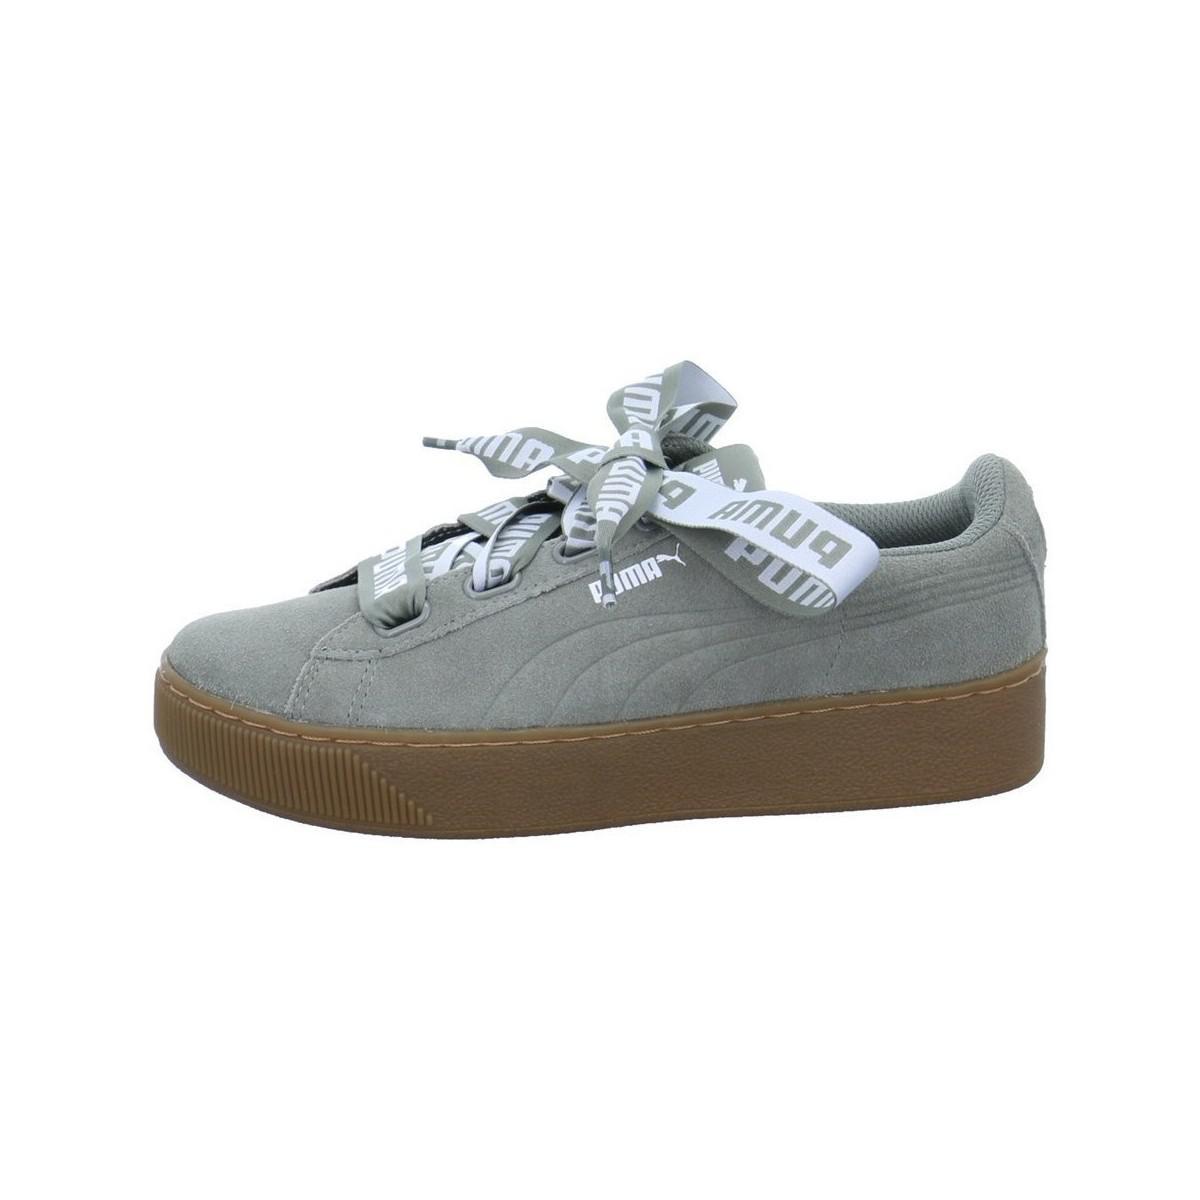 10f675d32410 Puma Vikky Platform Ribbon Men s Shoes (trainers) In Multicolour for ...